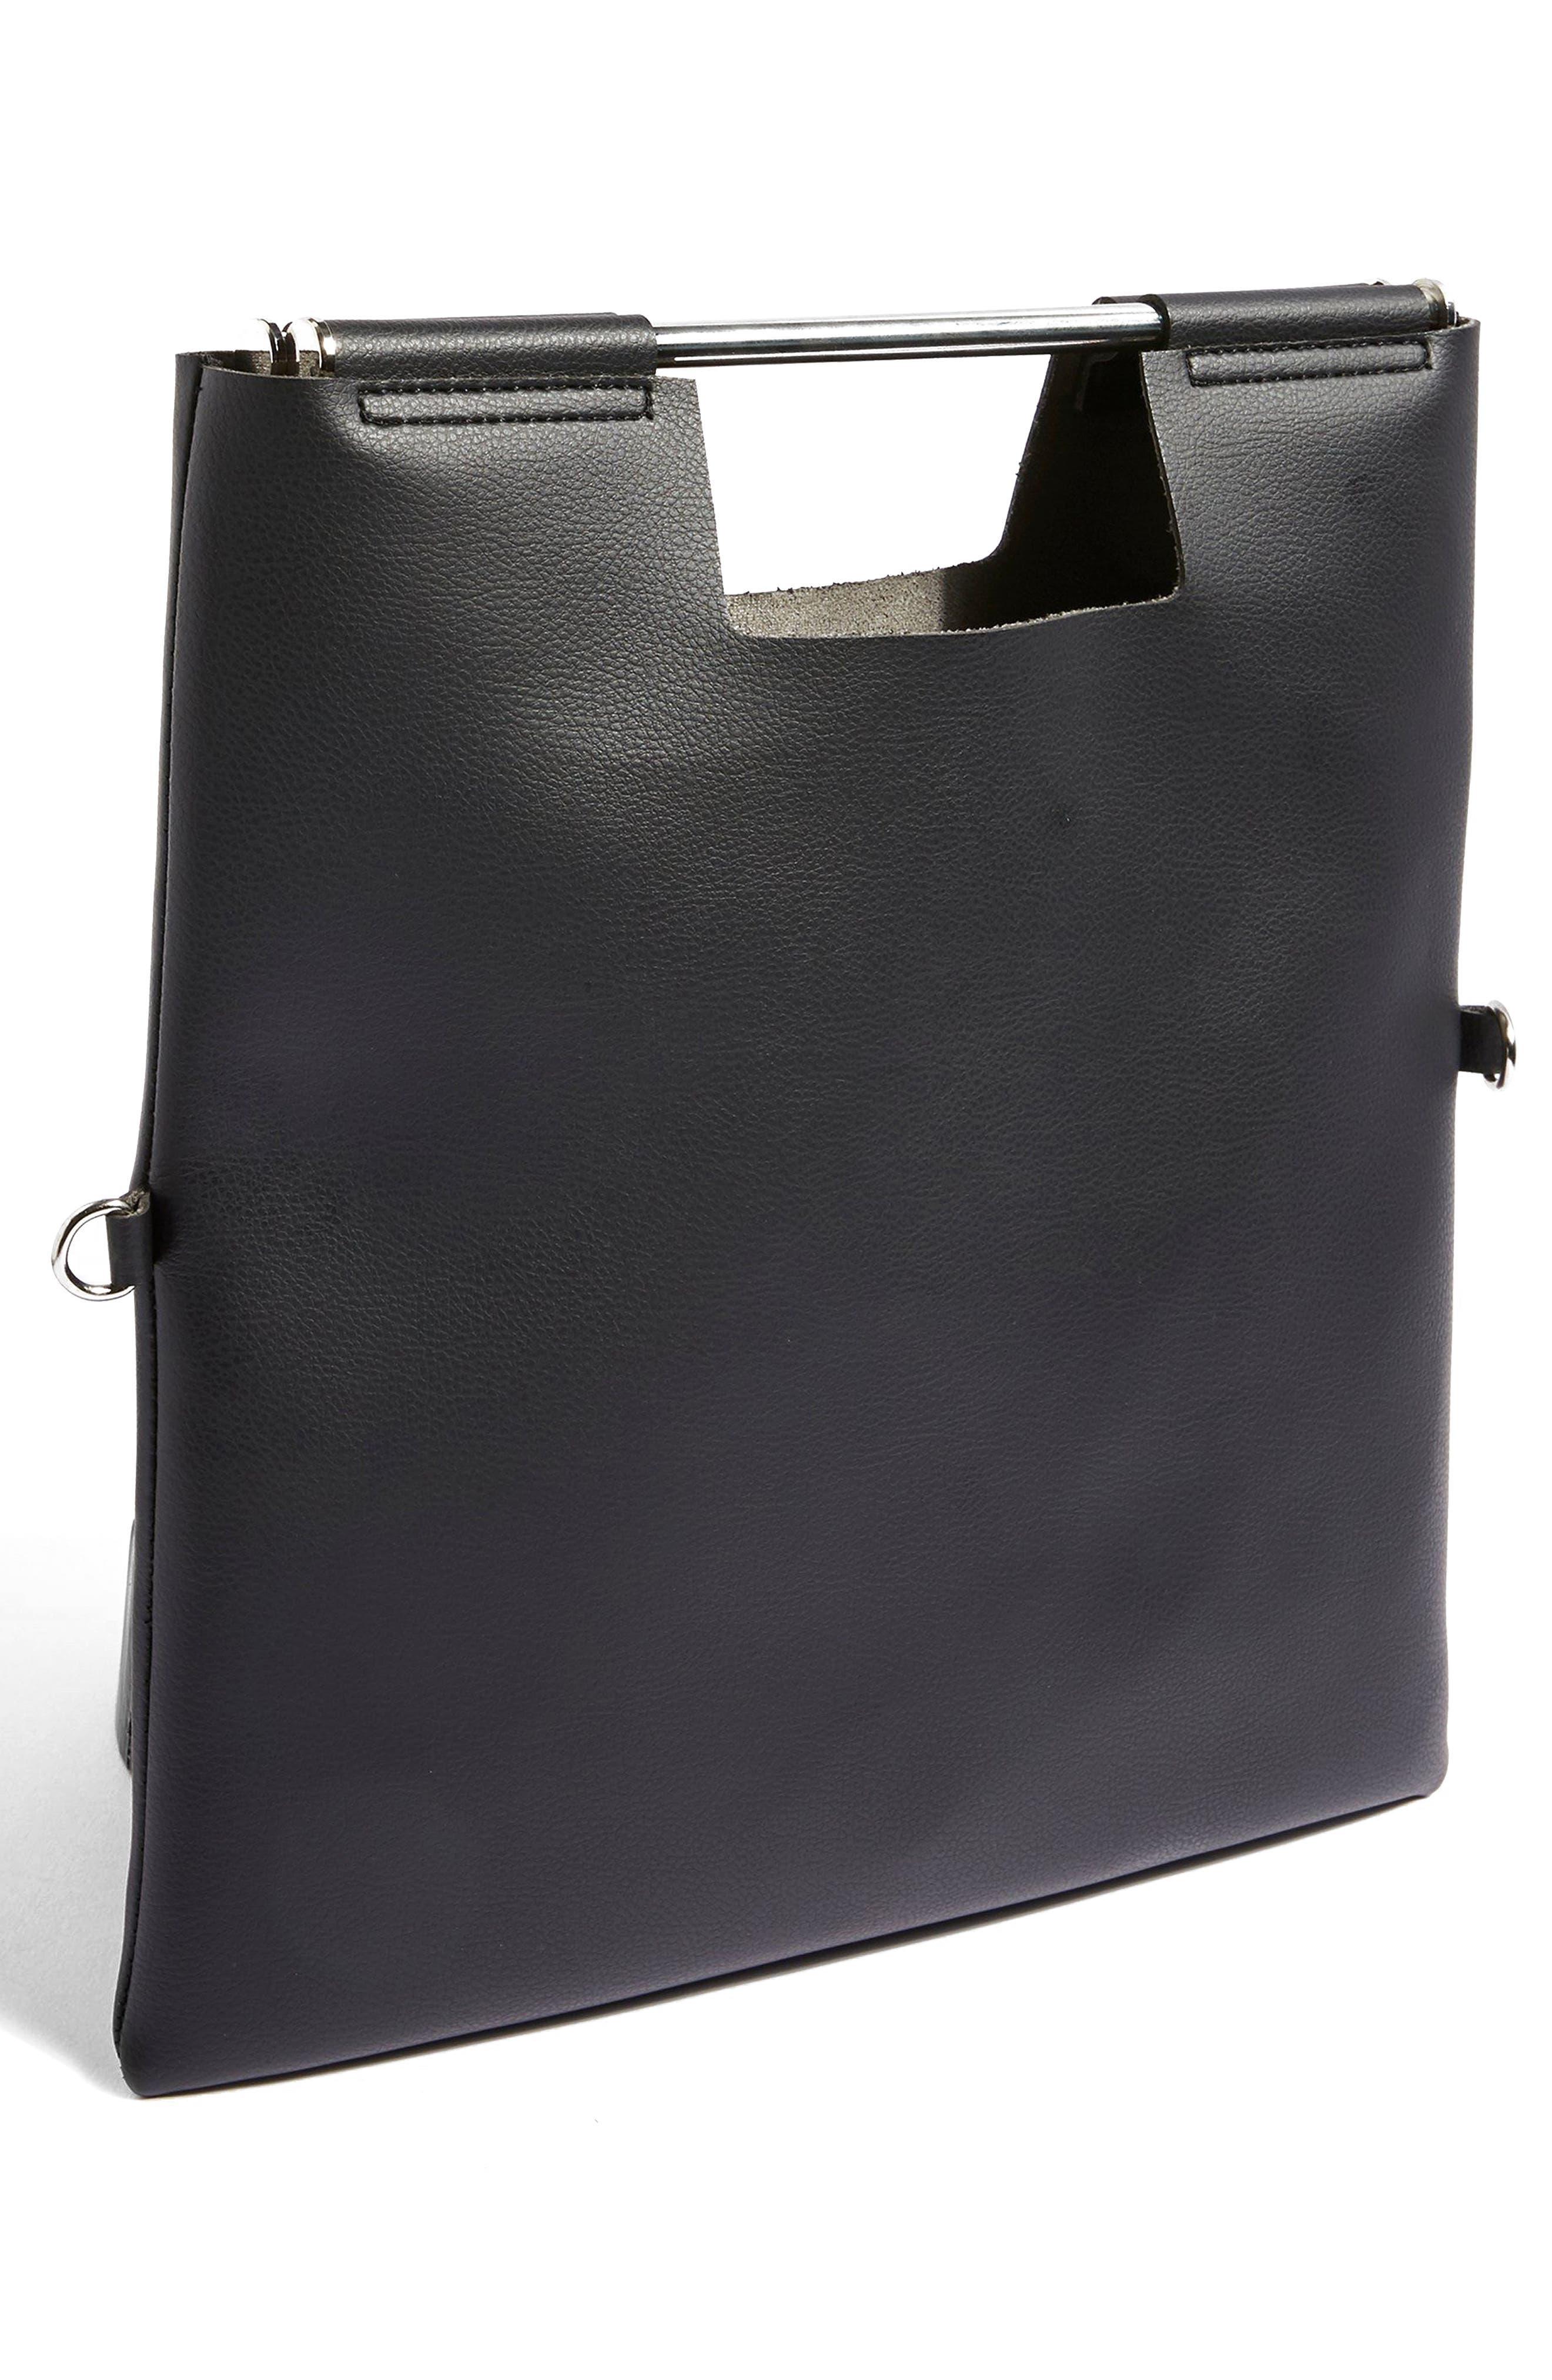 Lotus Metal Handle Clutch Bag,                             Alternate thumbnail 4, color,                             Black